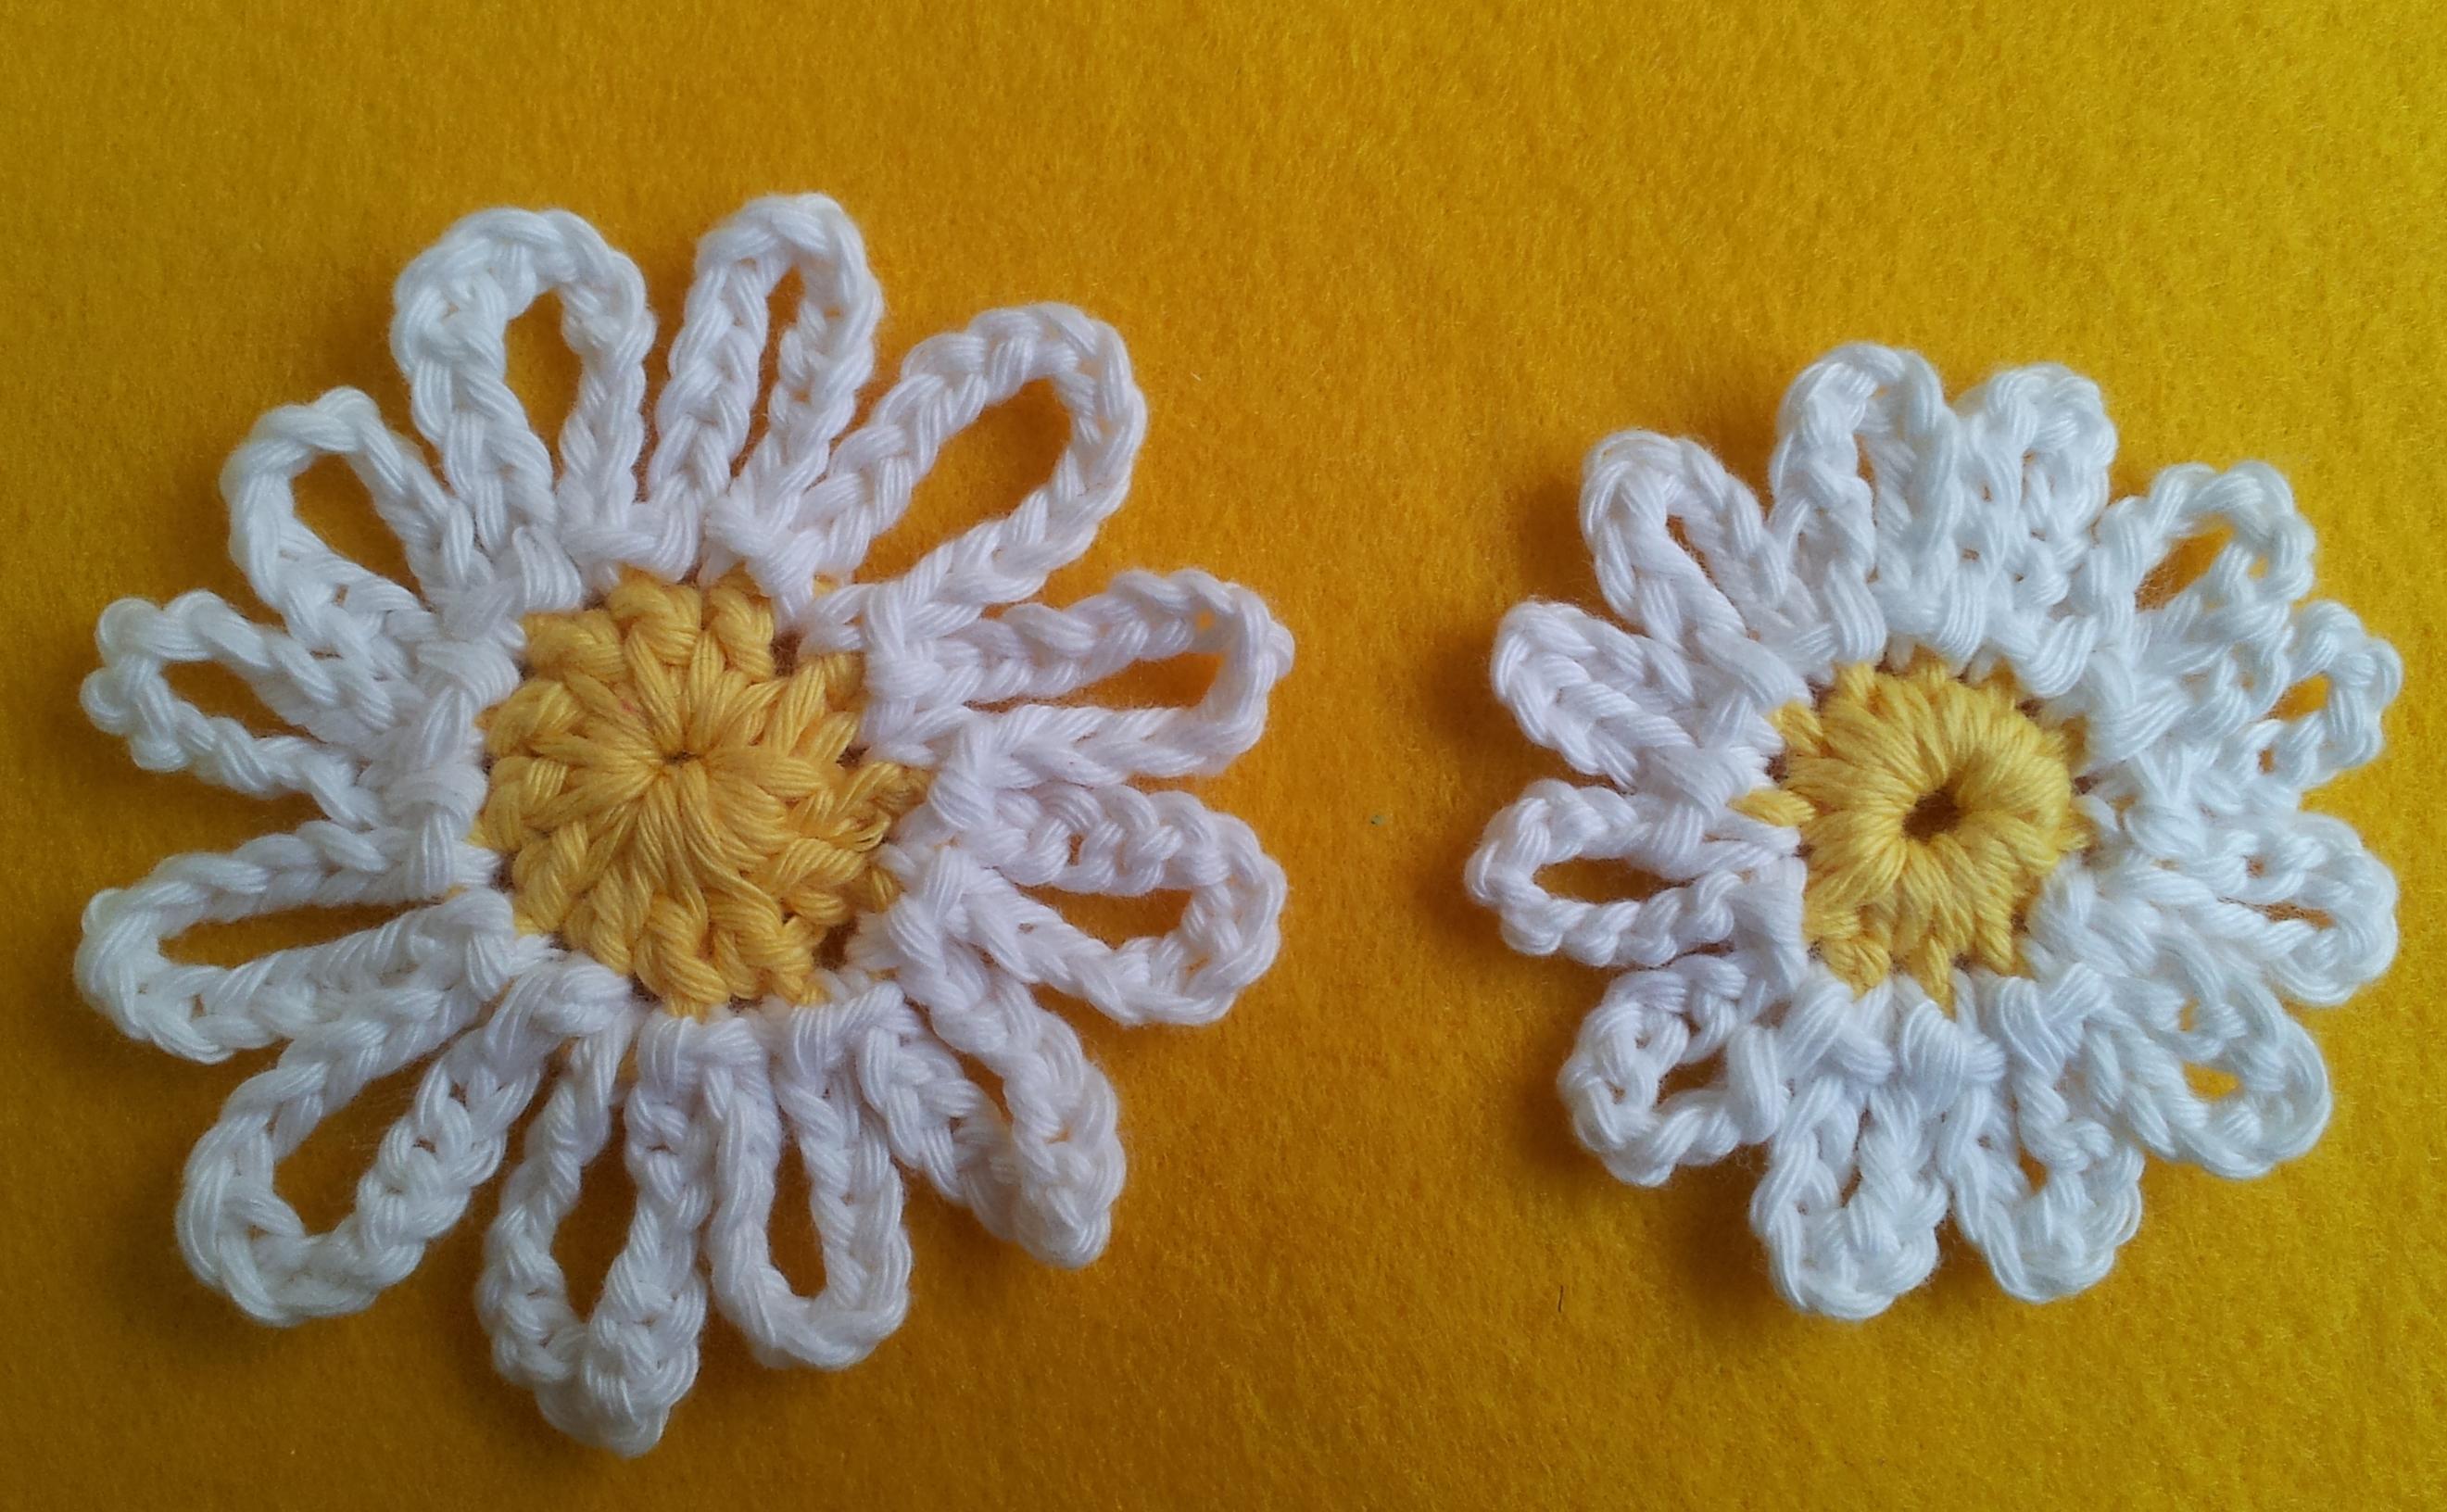 Daisy crochet bunting free pattern thestitchsharer large uk treble and smaller uk double daisy izmirmasajfo